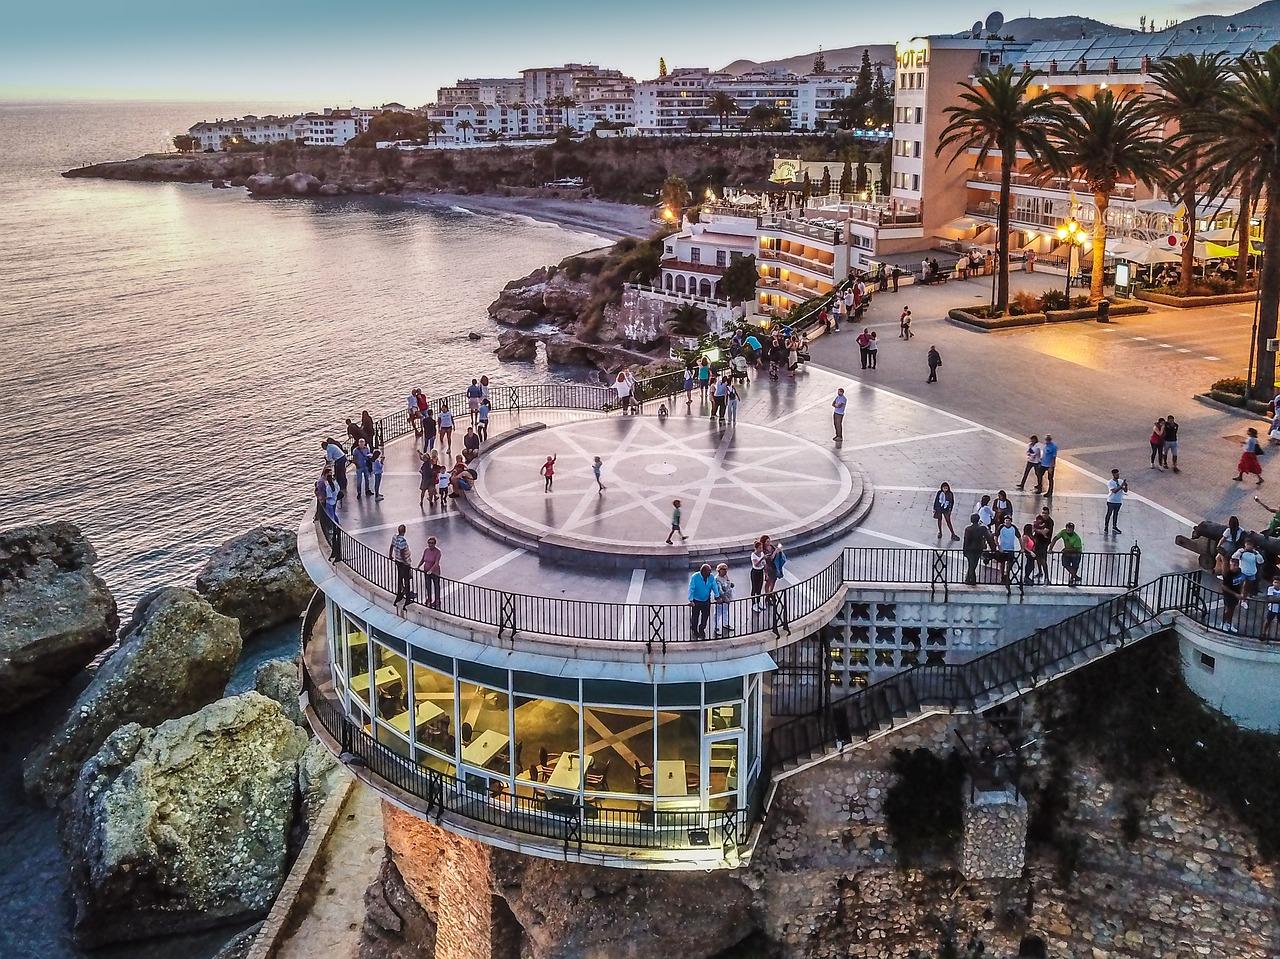 nerja pixabay - De 24 mooiste plekken in Andalusië: natuur, dorpjes & steden